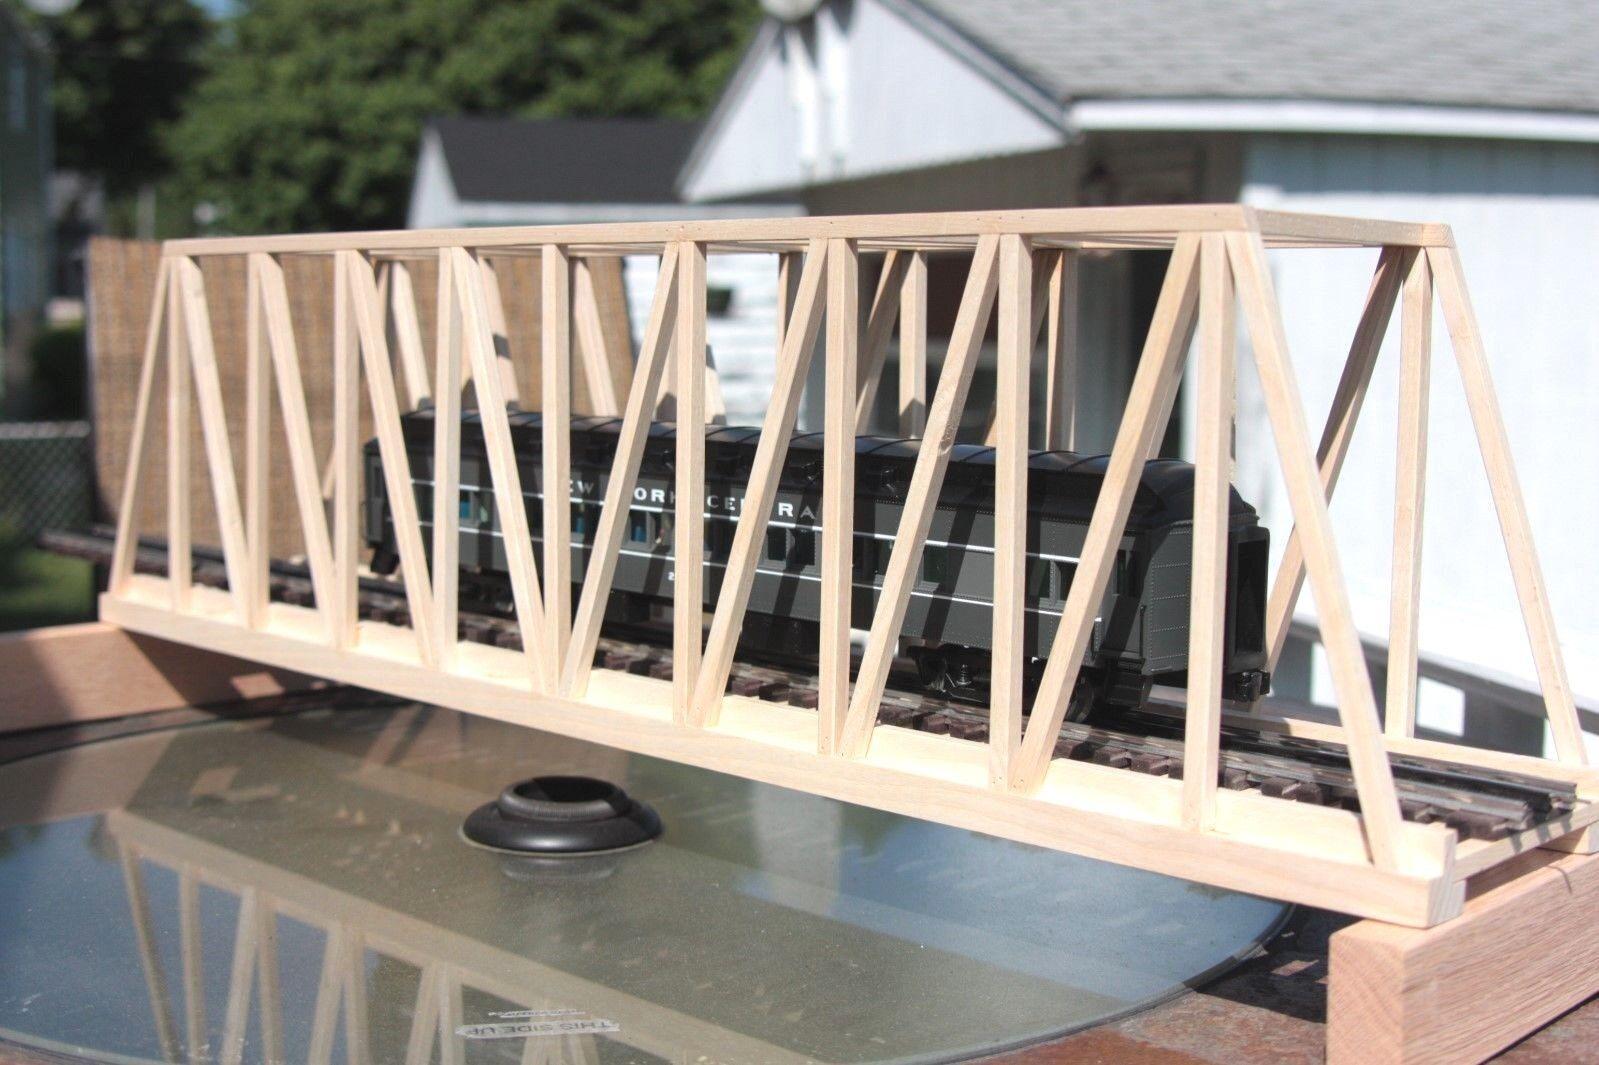 O Gauge handmade wood thru truss bridge 30  long for Lionel, K Line,MTH, Atlas